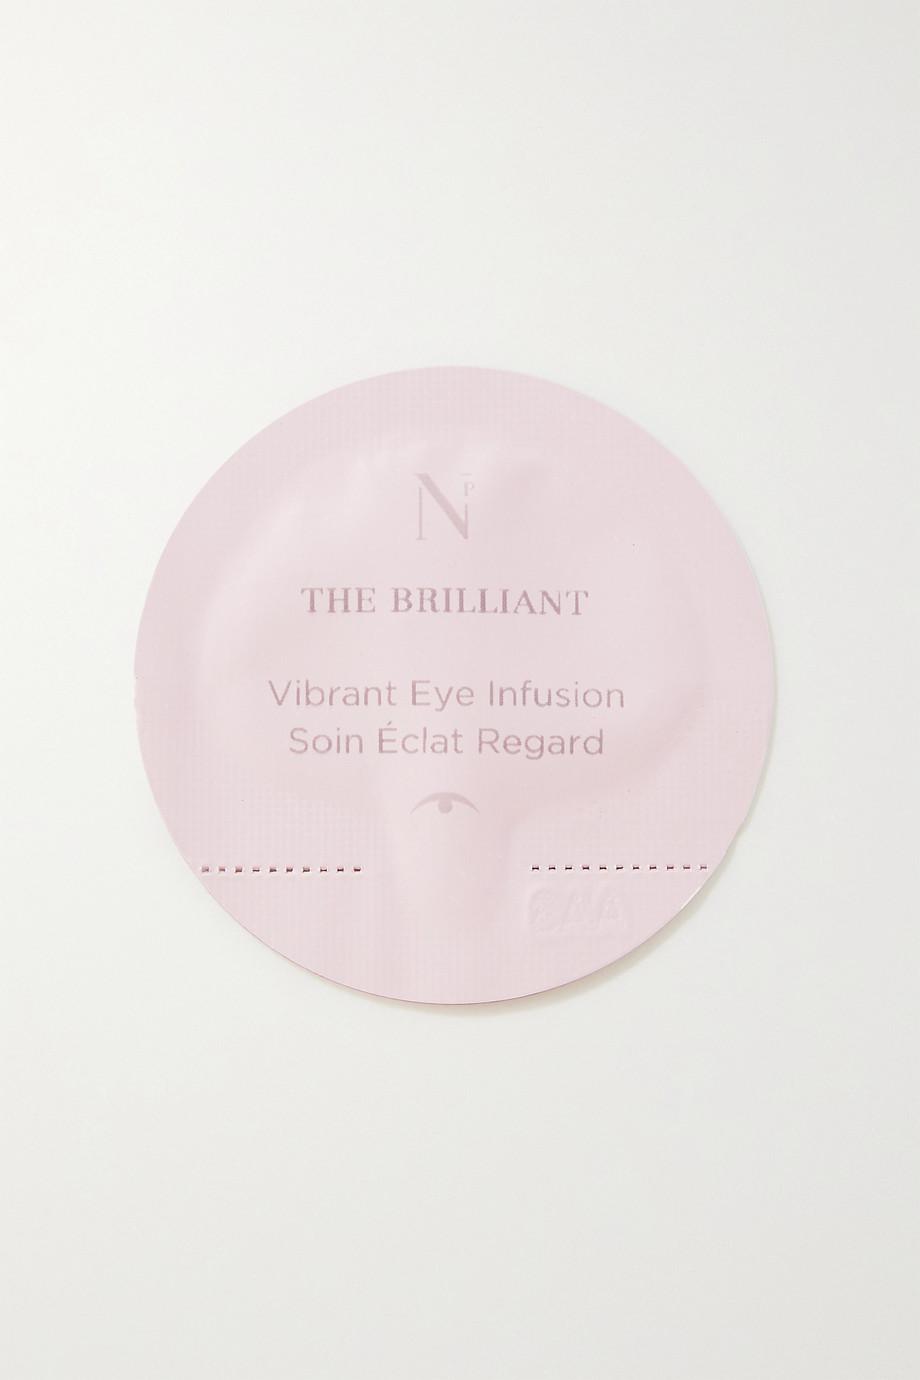 Noble Panacea The Brilliant Vibrant Eye Infusion Refill, 30 x 0,3 ml – Nachfüll-Augenserum